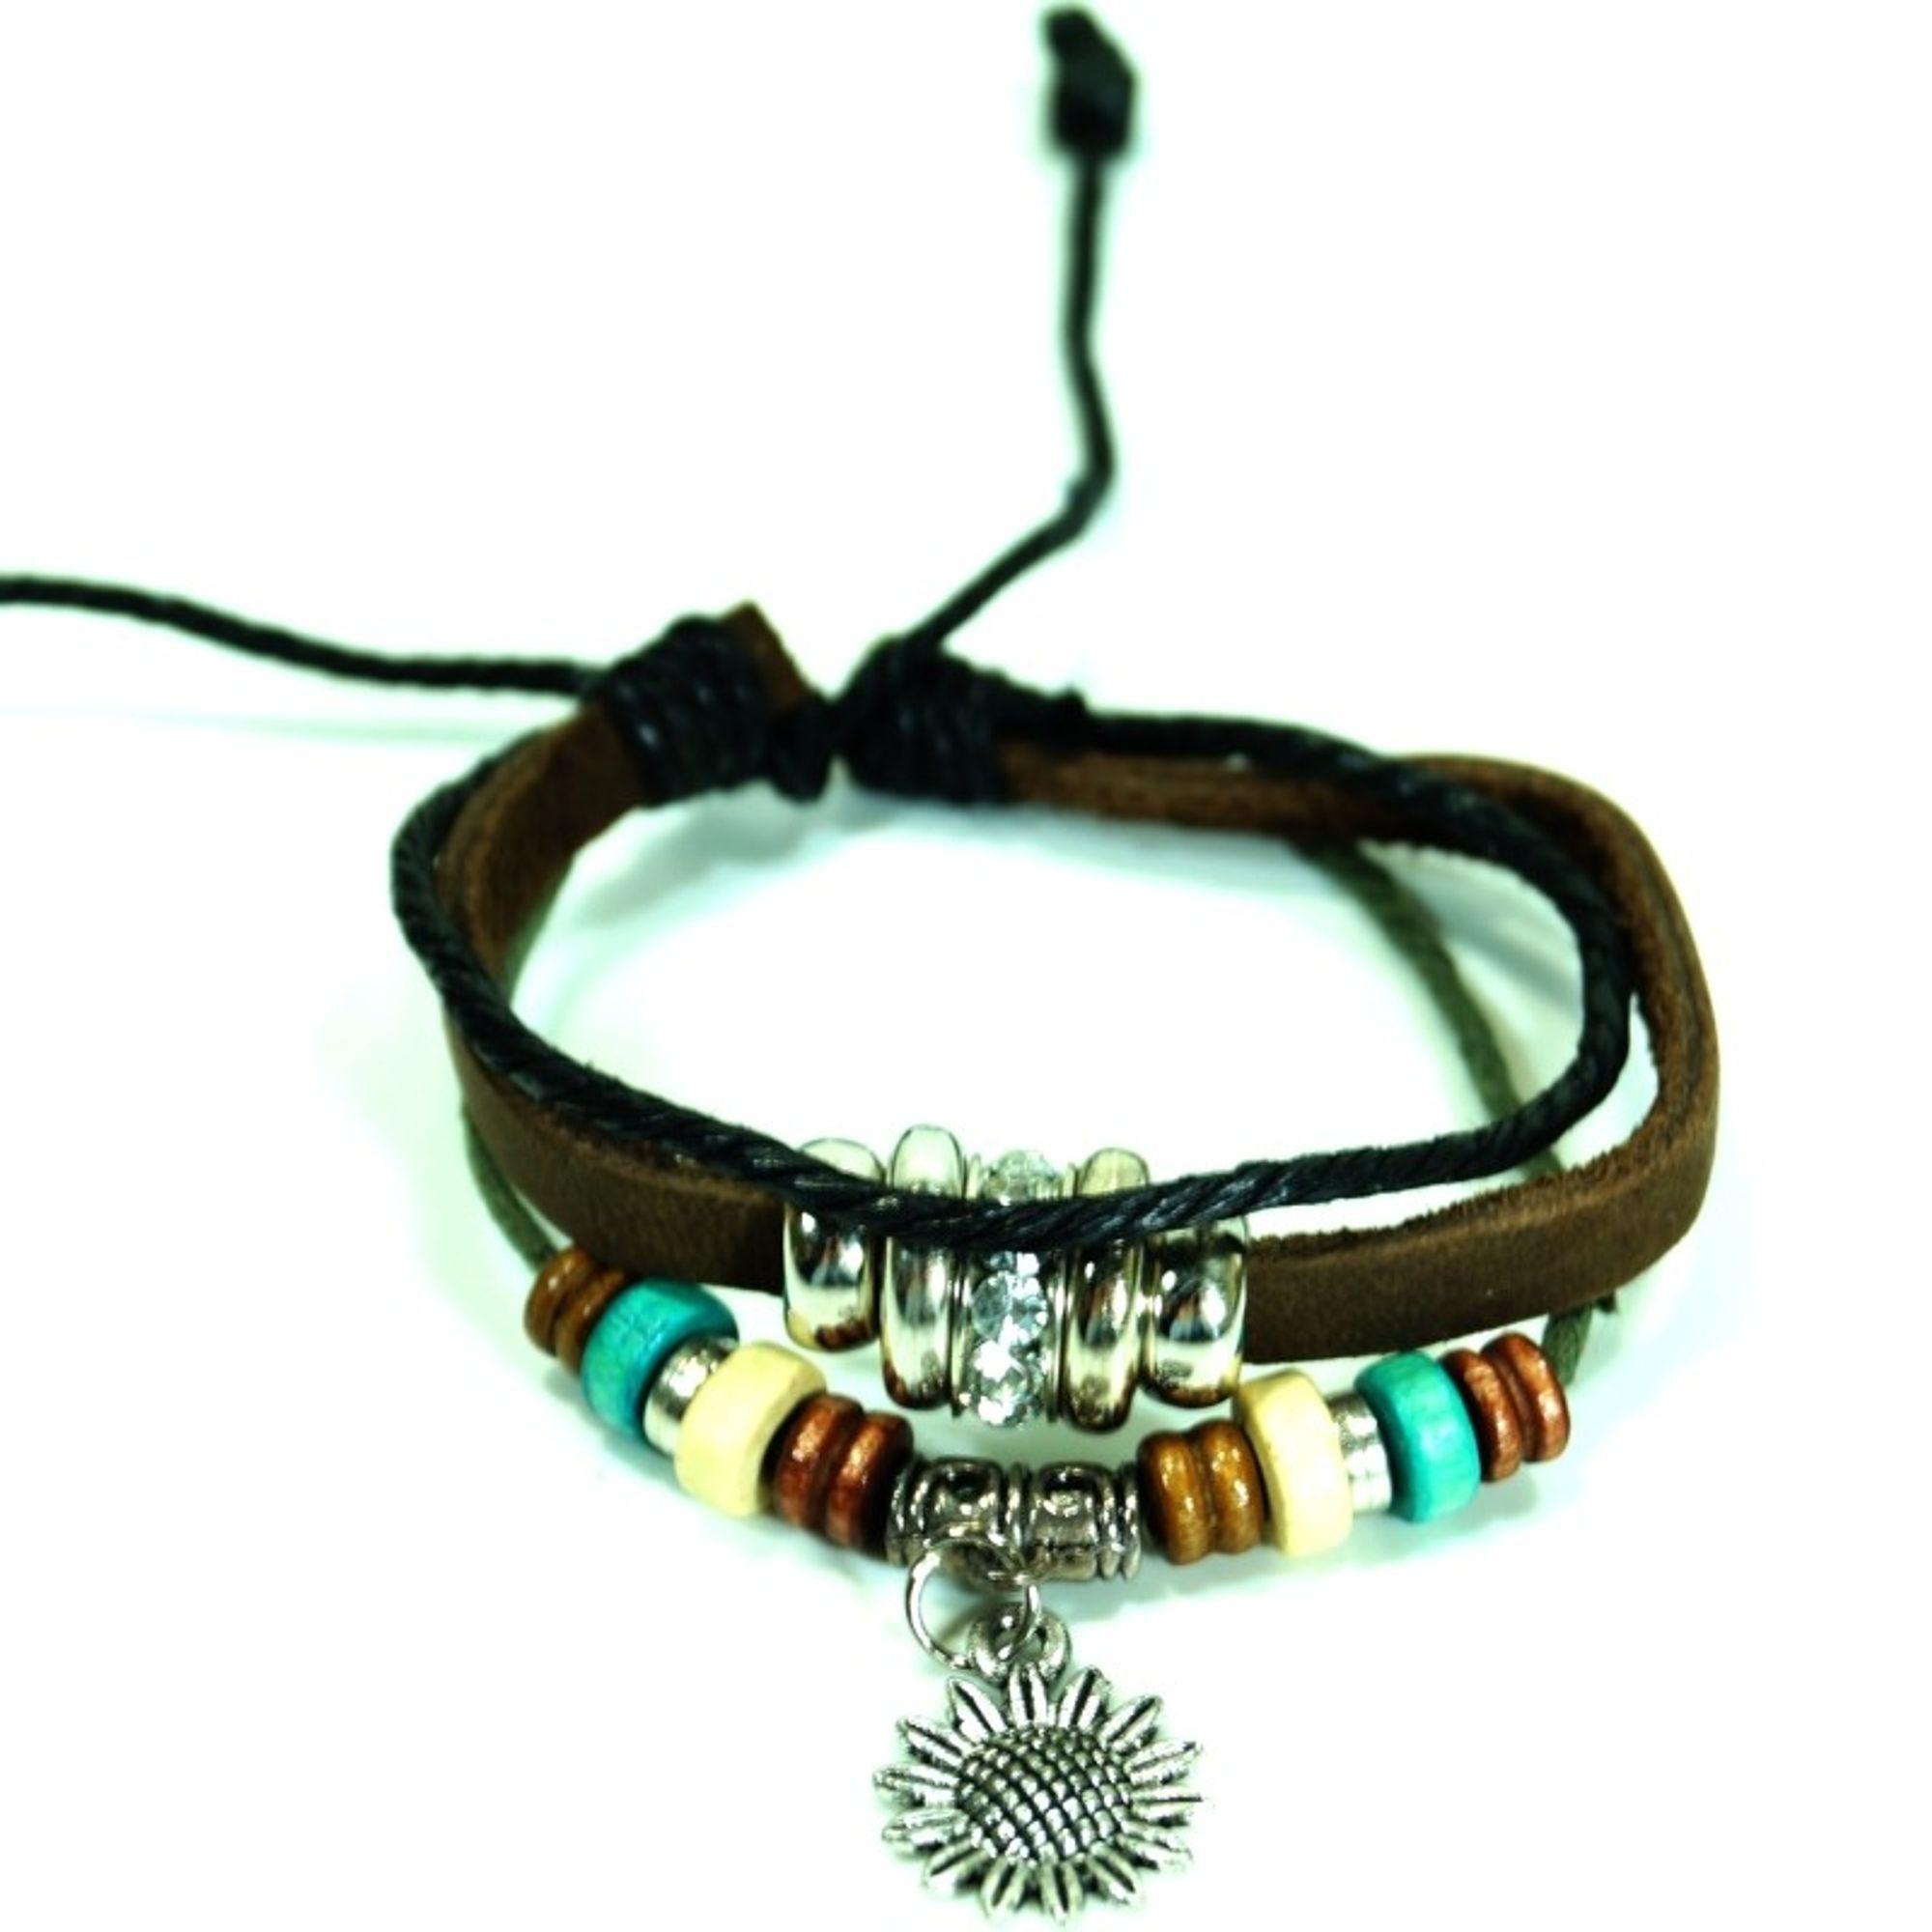 CJBB6147 Damen Armband Blume Leder braun